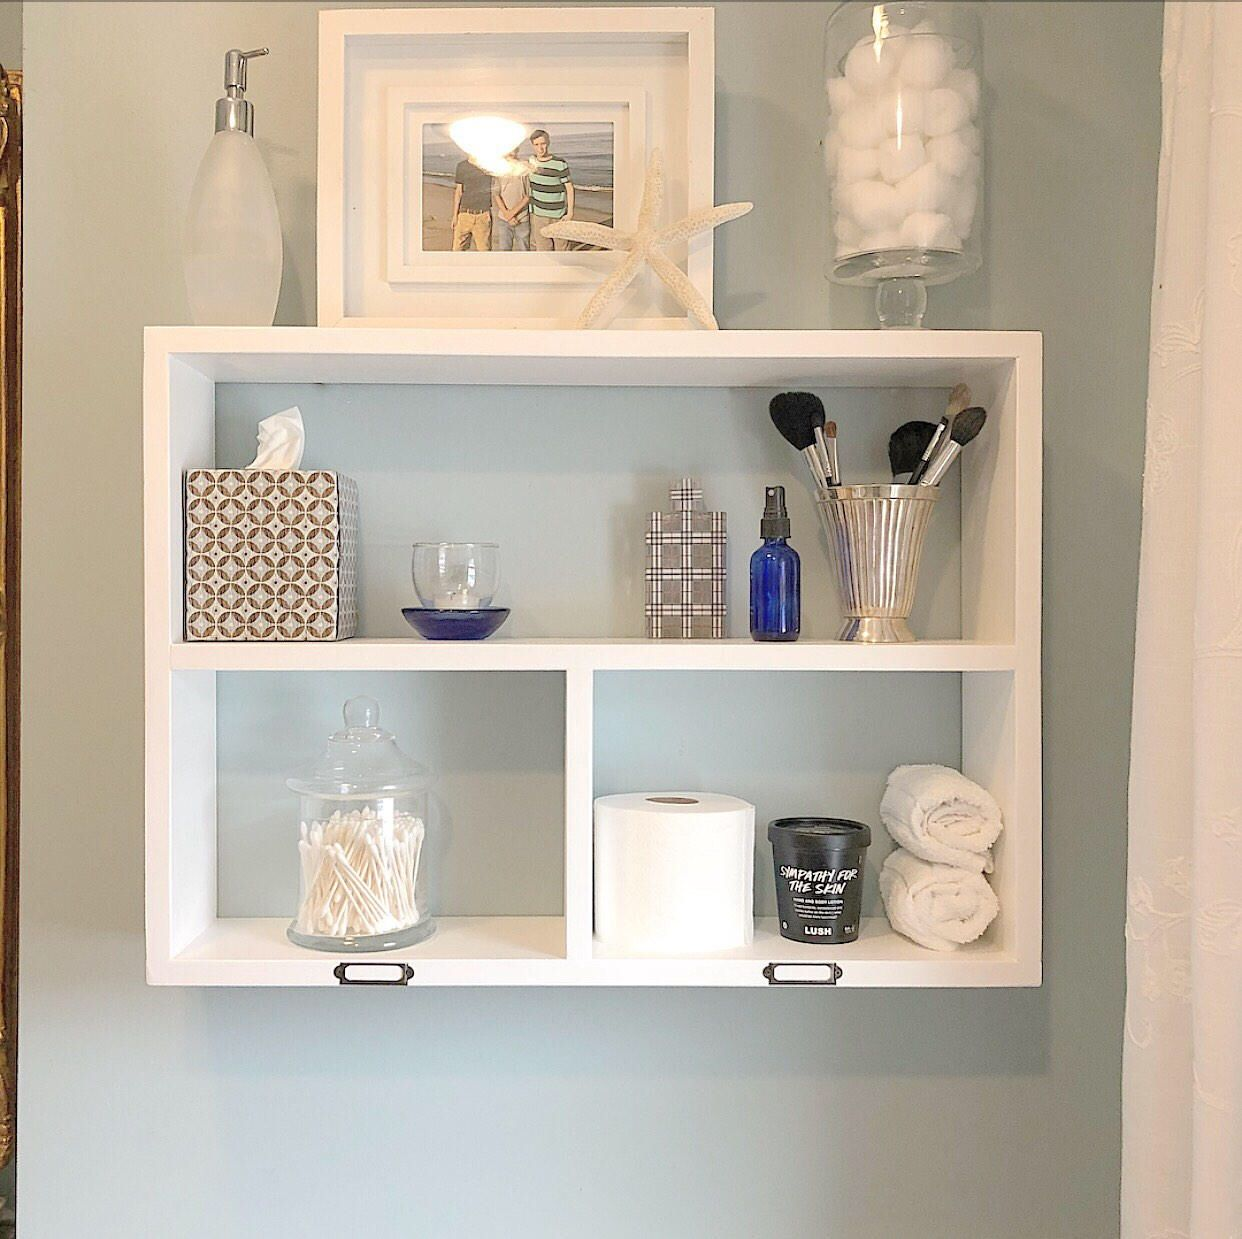 Bathroom Cabinet - Bedroom Shelf - Bathroom Shelf with Storage ...